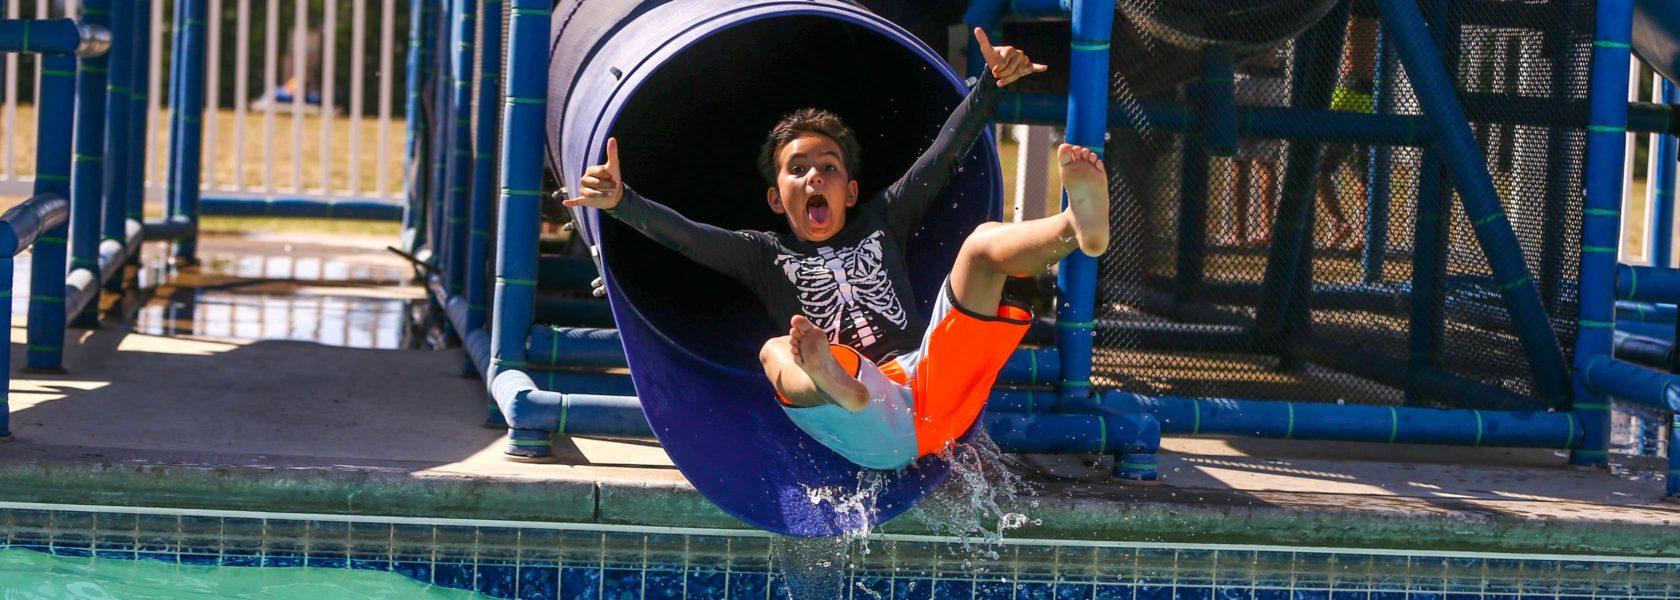 A camper going down a slide